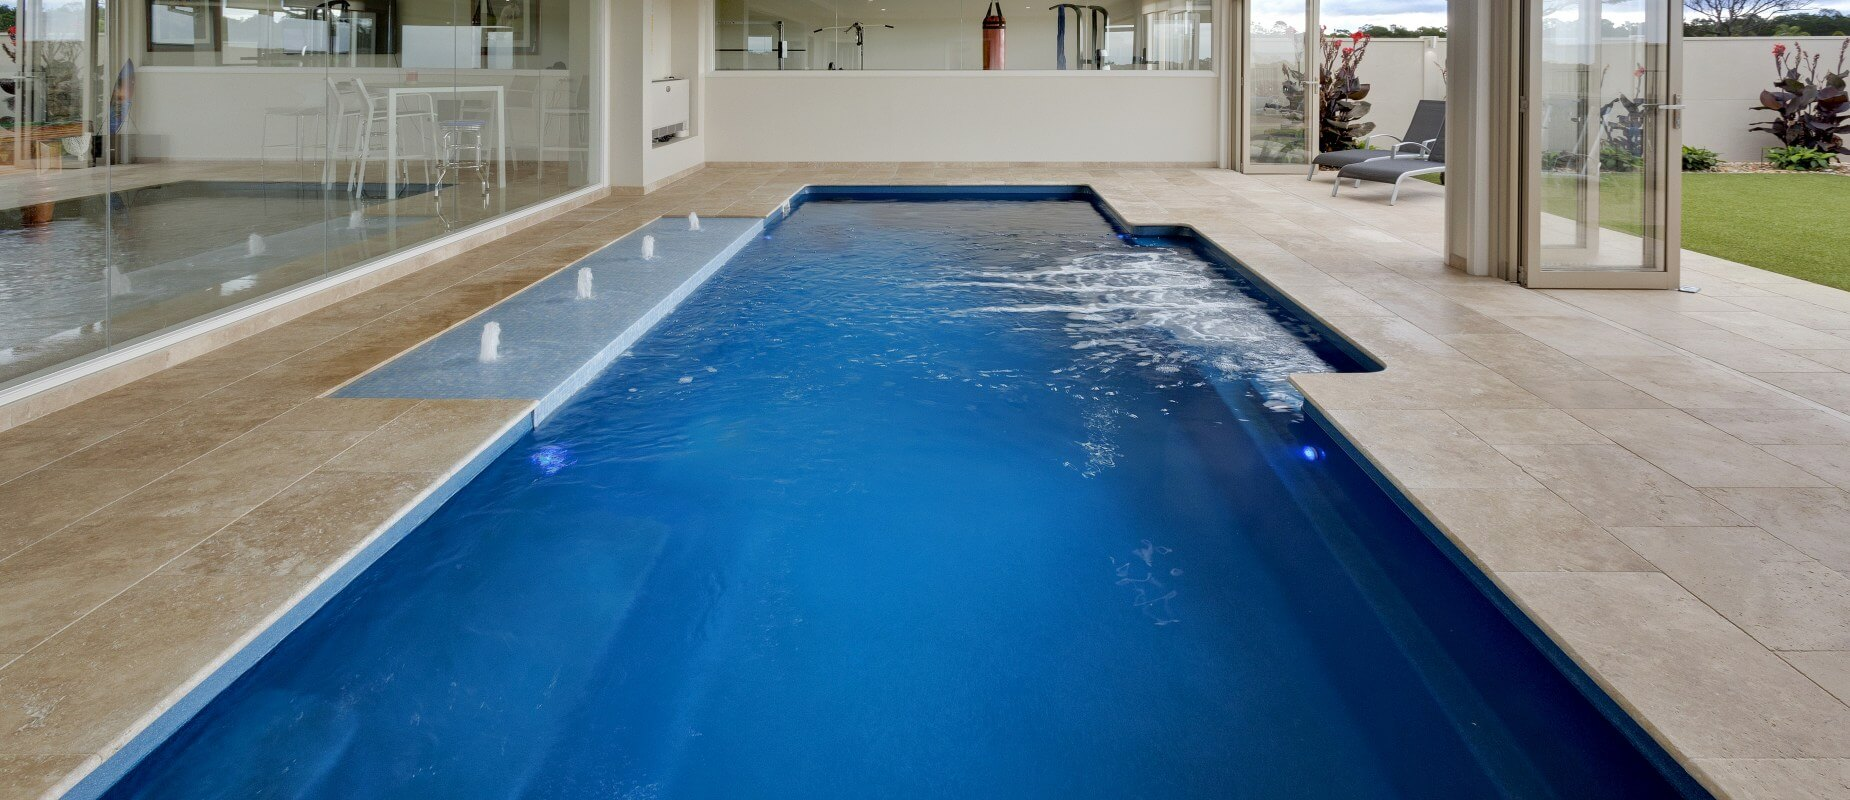 piscina de lux modele frumoase 3